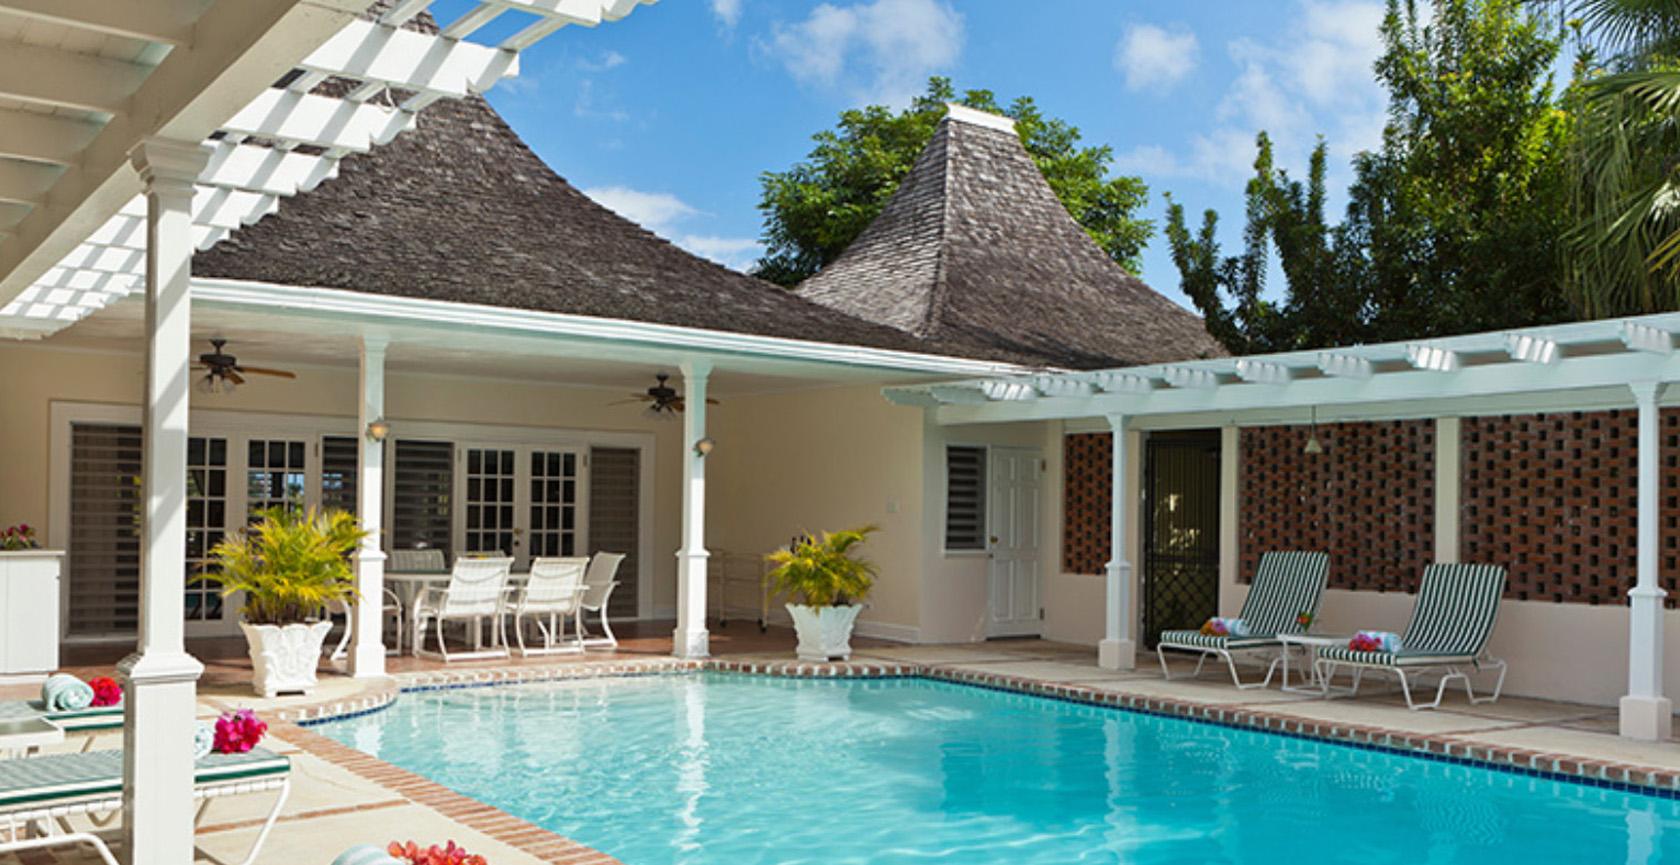 Linger longer hanover holiday letting vacation rentals Jamaica vacation homes